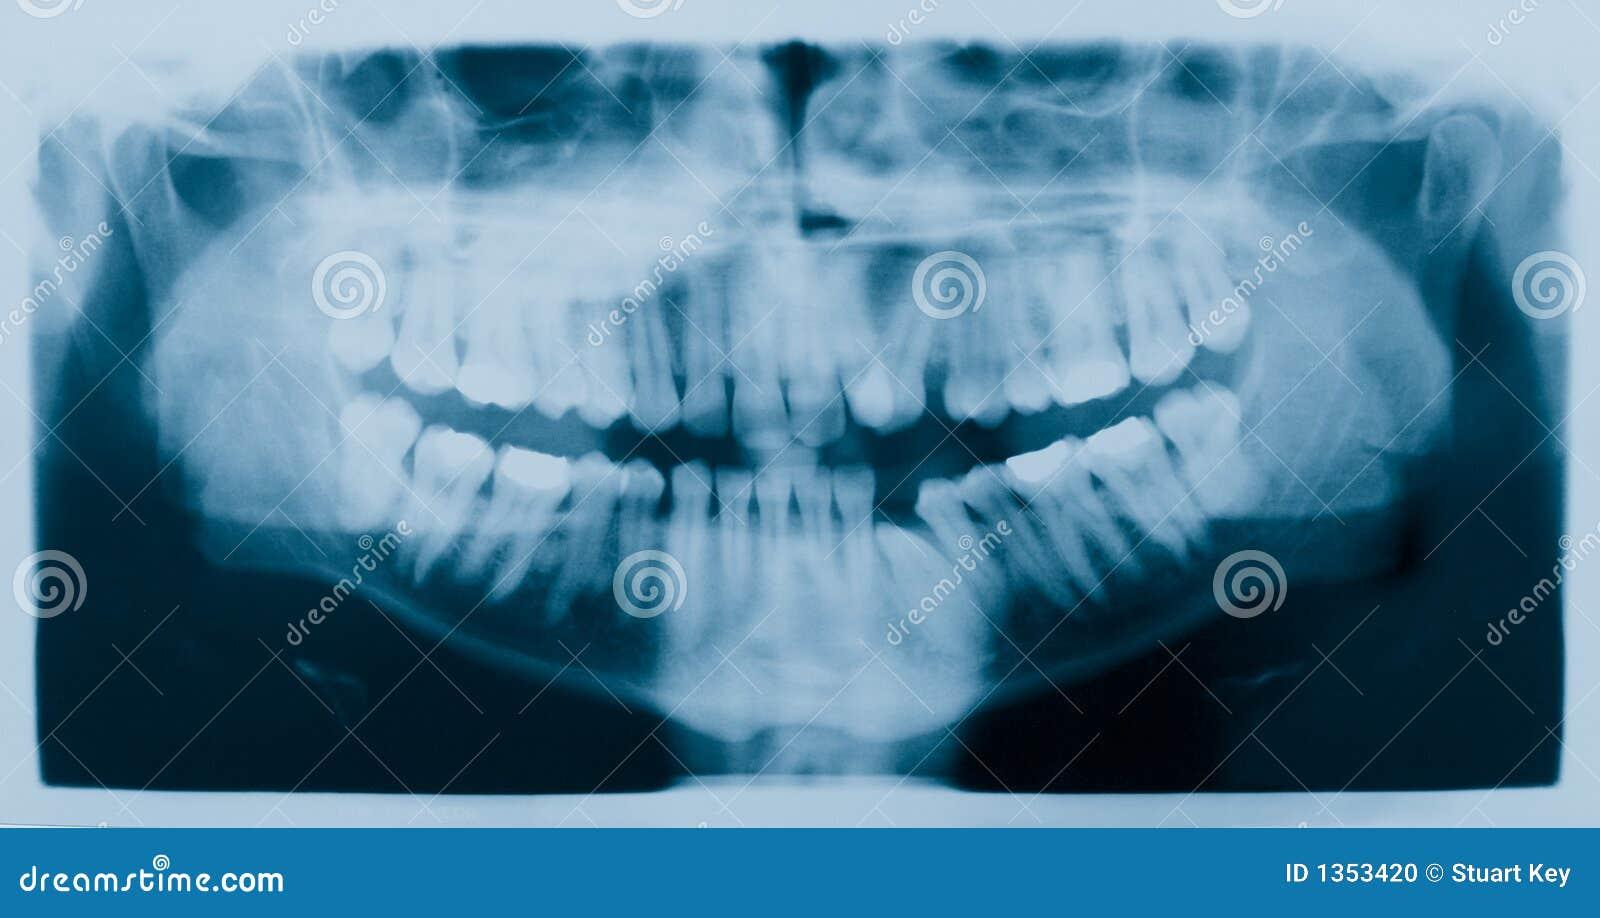 Rayon X dentaire (rayon X)